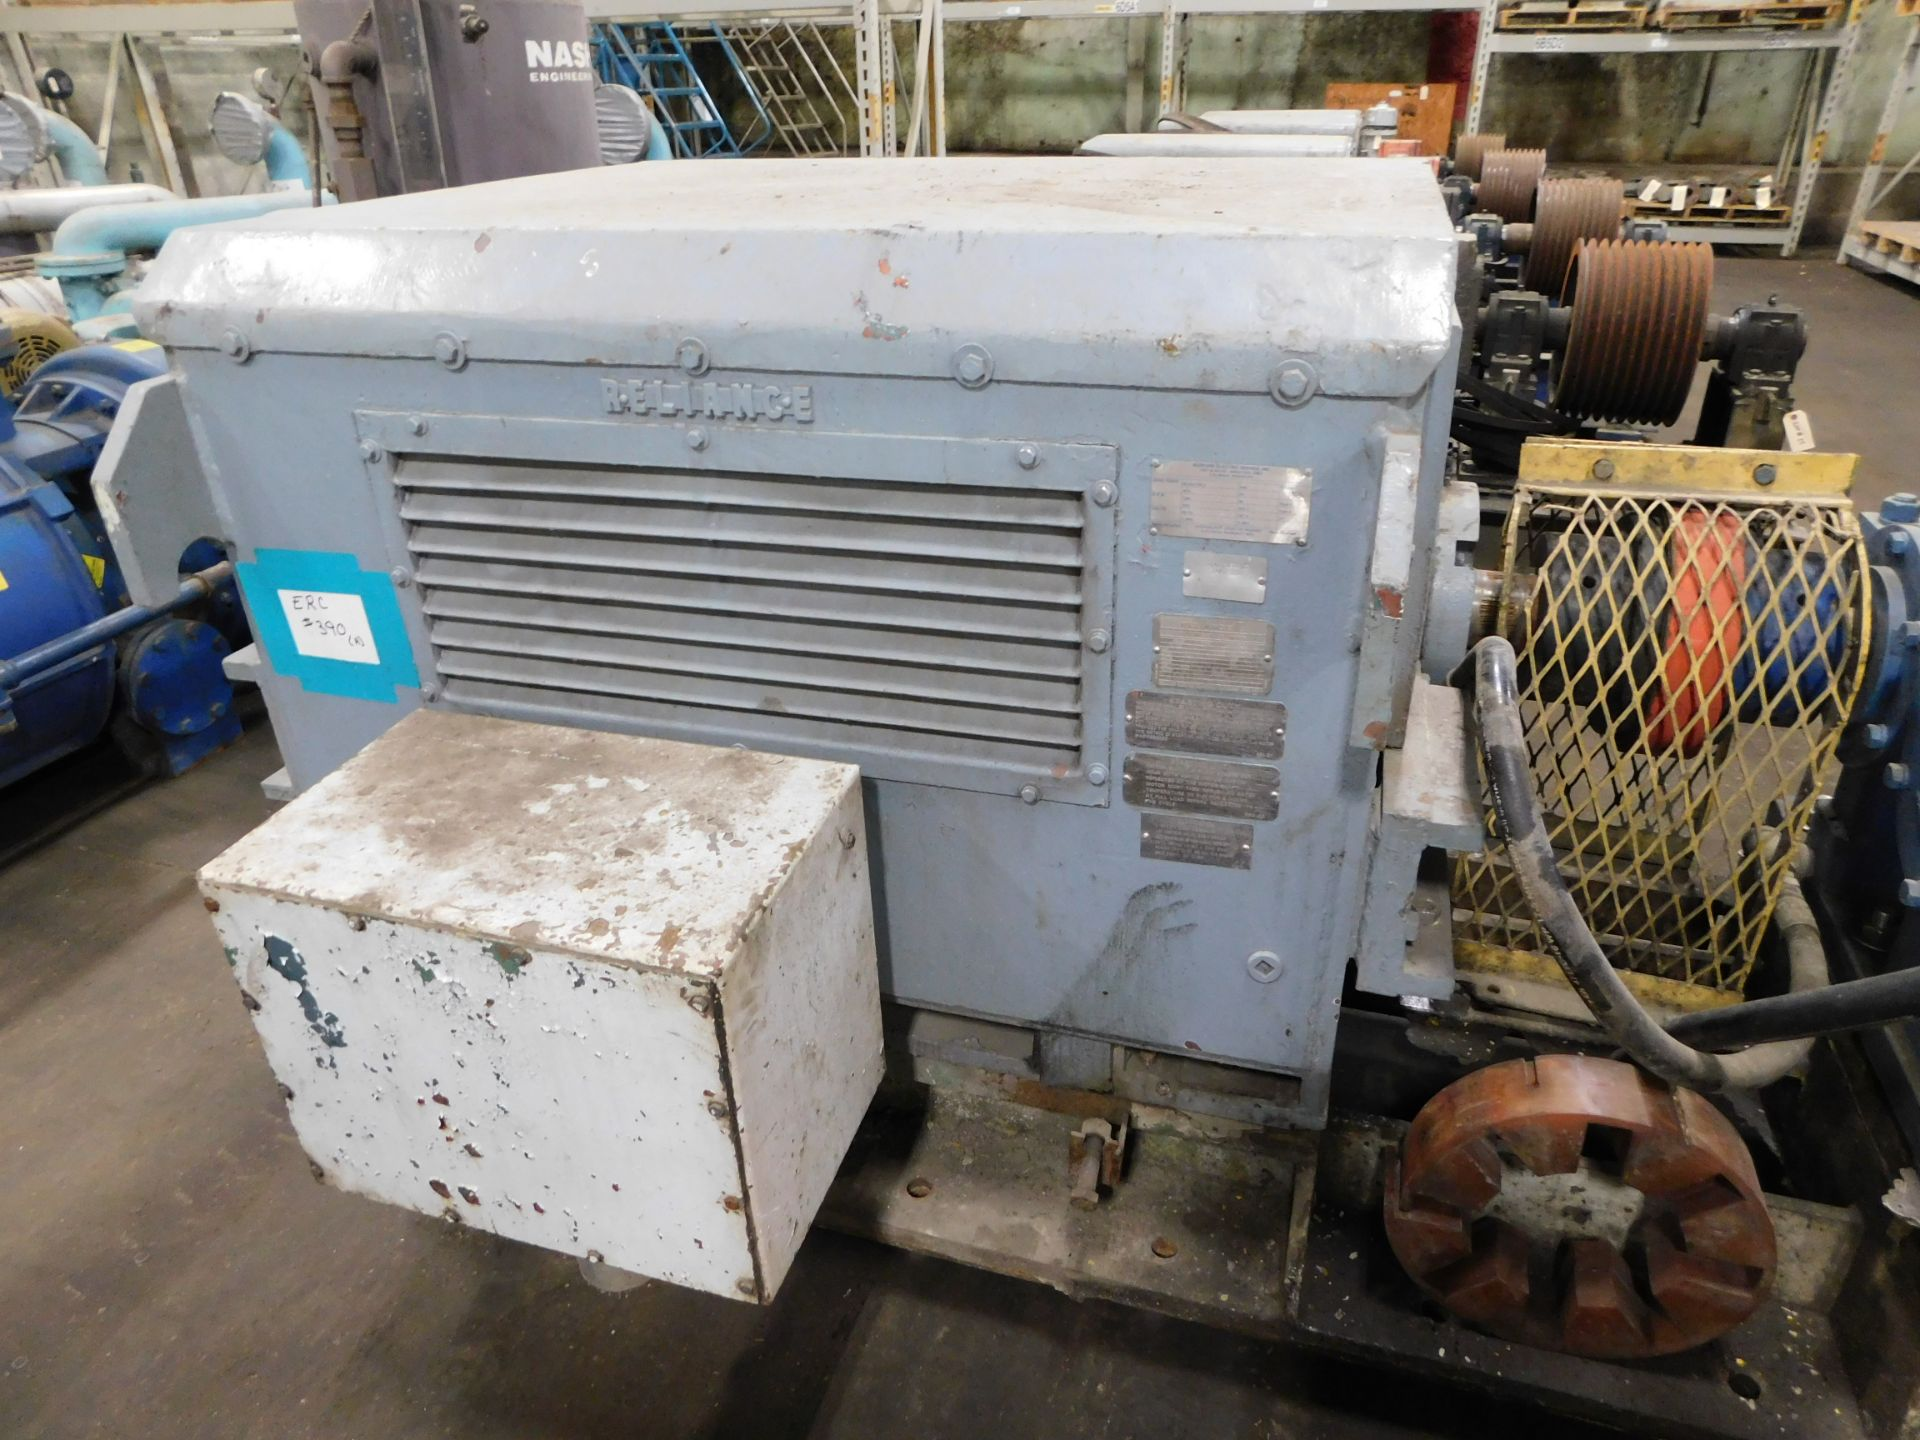 Reliance AC Duty Master Motor. 900 HP. 3 Ph. 60 Hz. 4160 V. 1789 RPM. 6809S. Type P. - Image 4 of 10